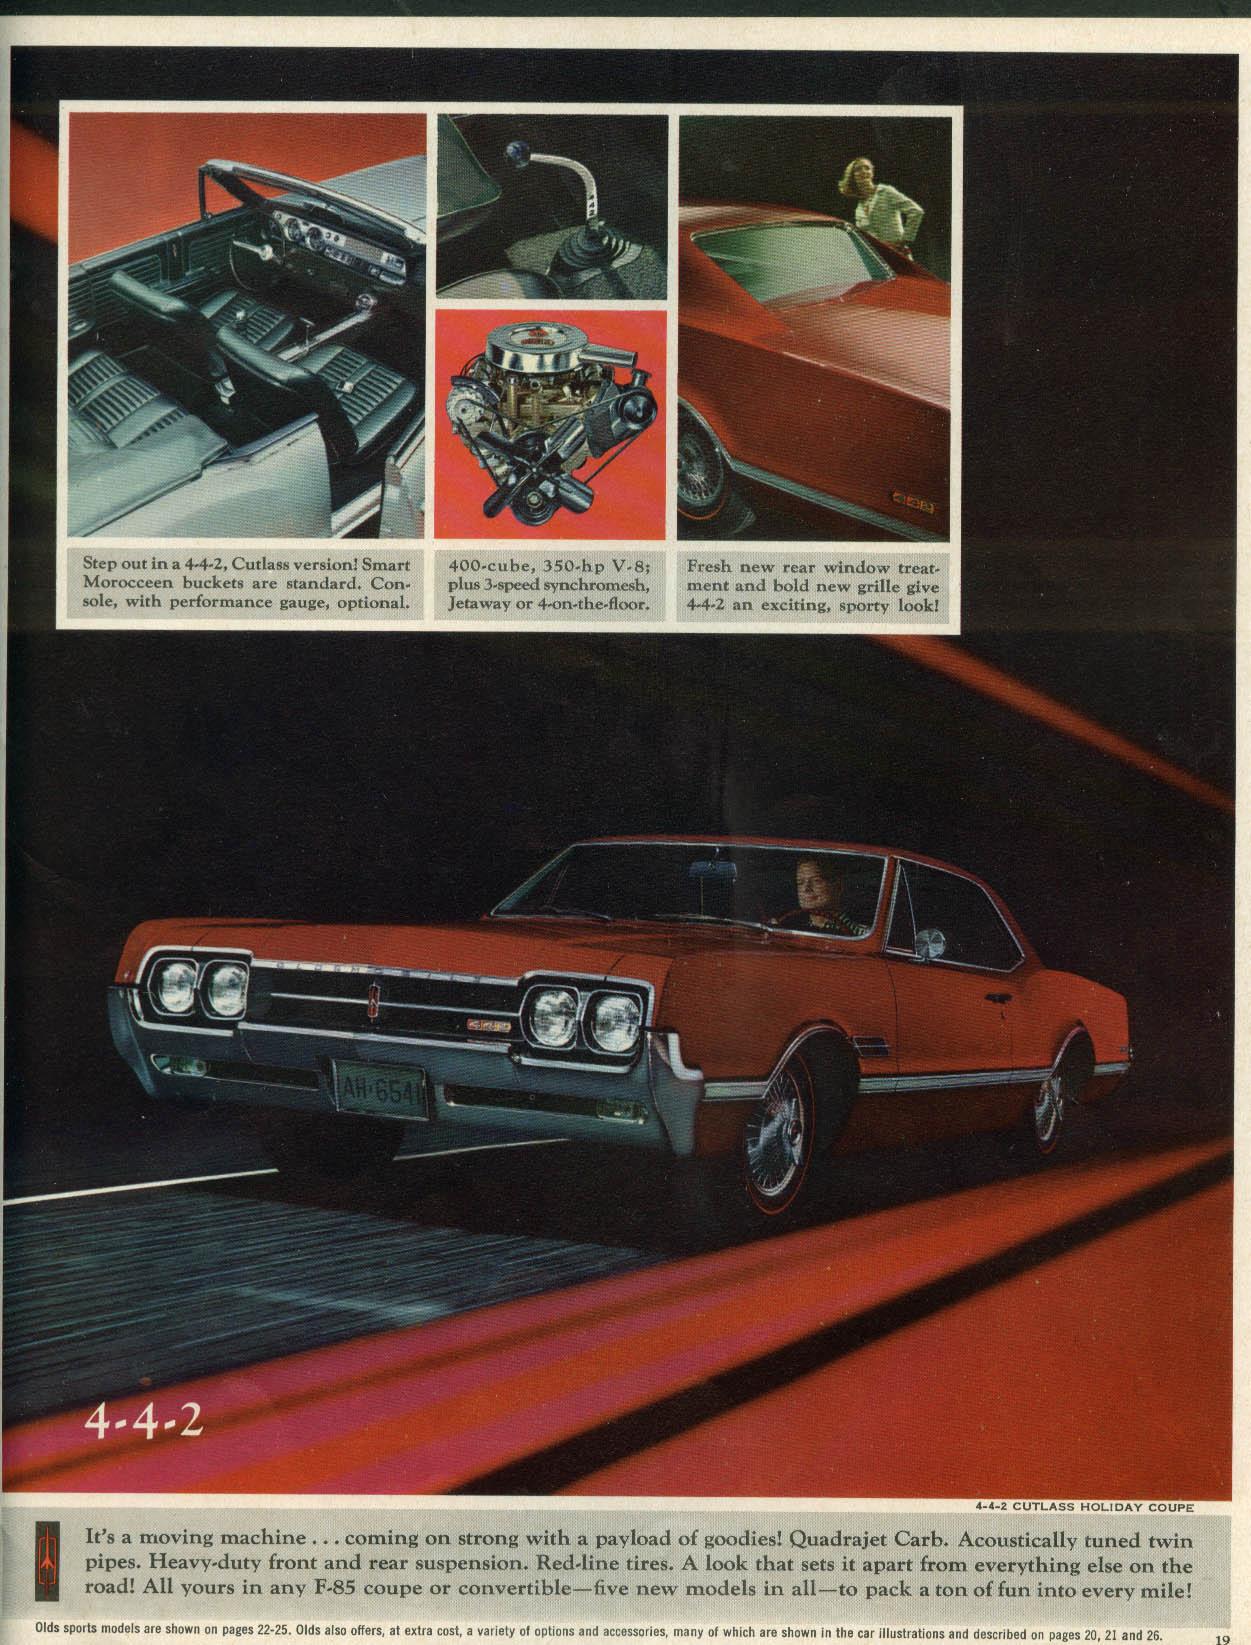 Oldsmobile Toronado 98 88 Starfire 4-4-2 Cutlass F-85 VistaCruiser brochure 1966